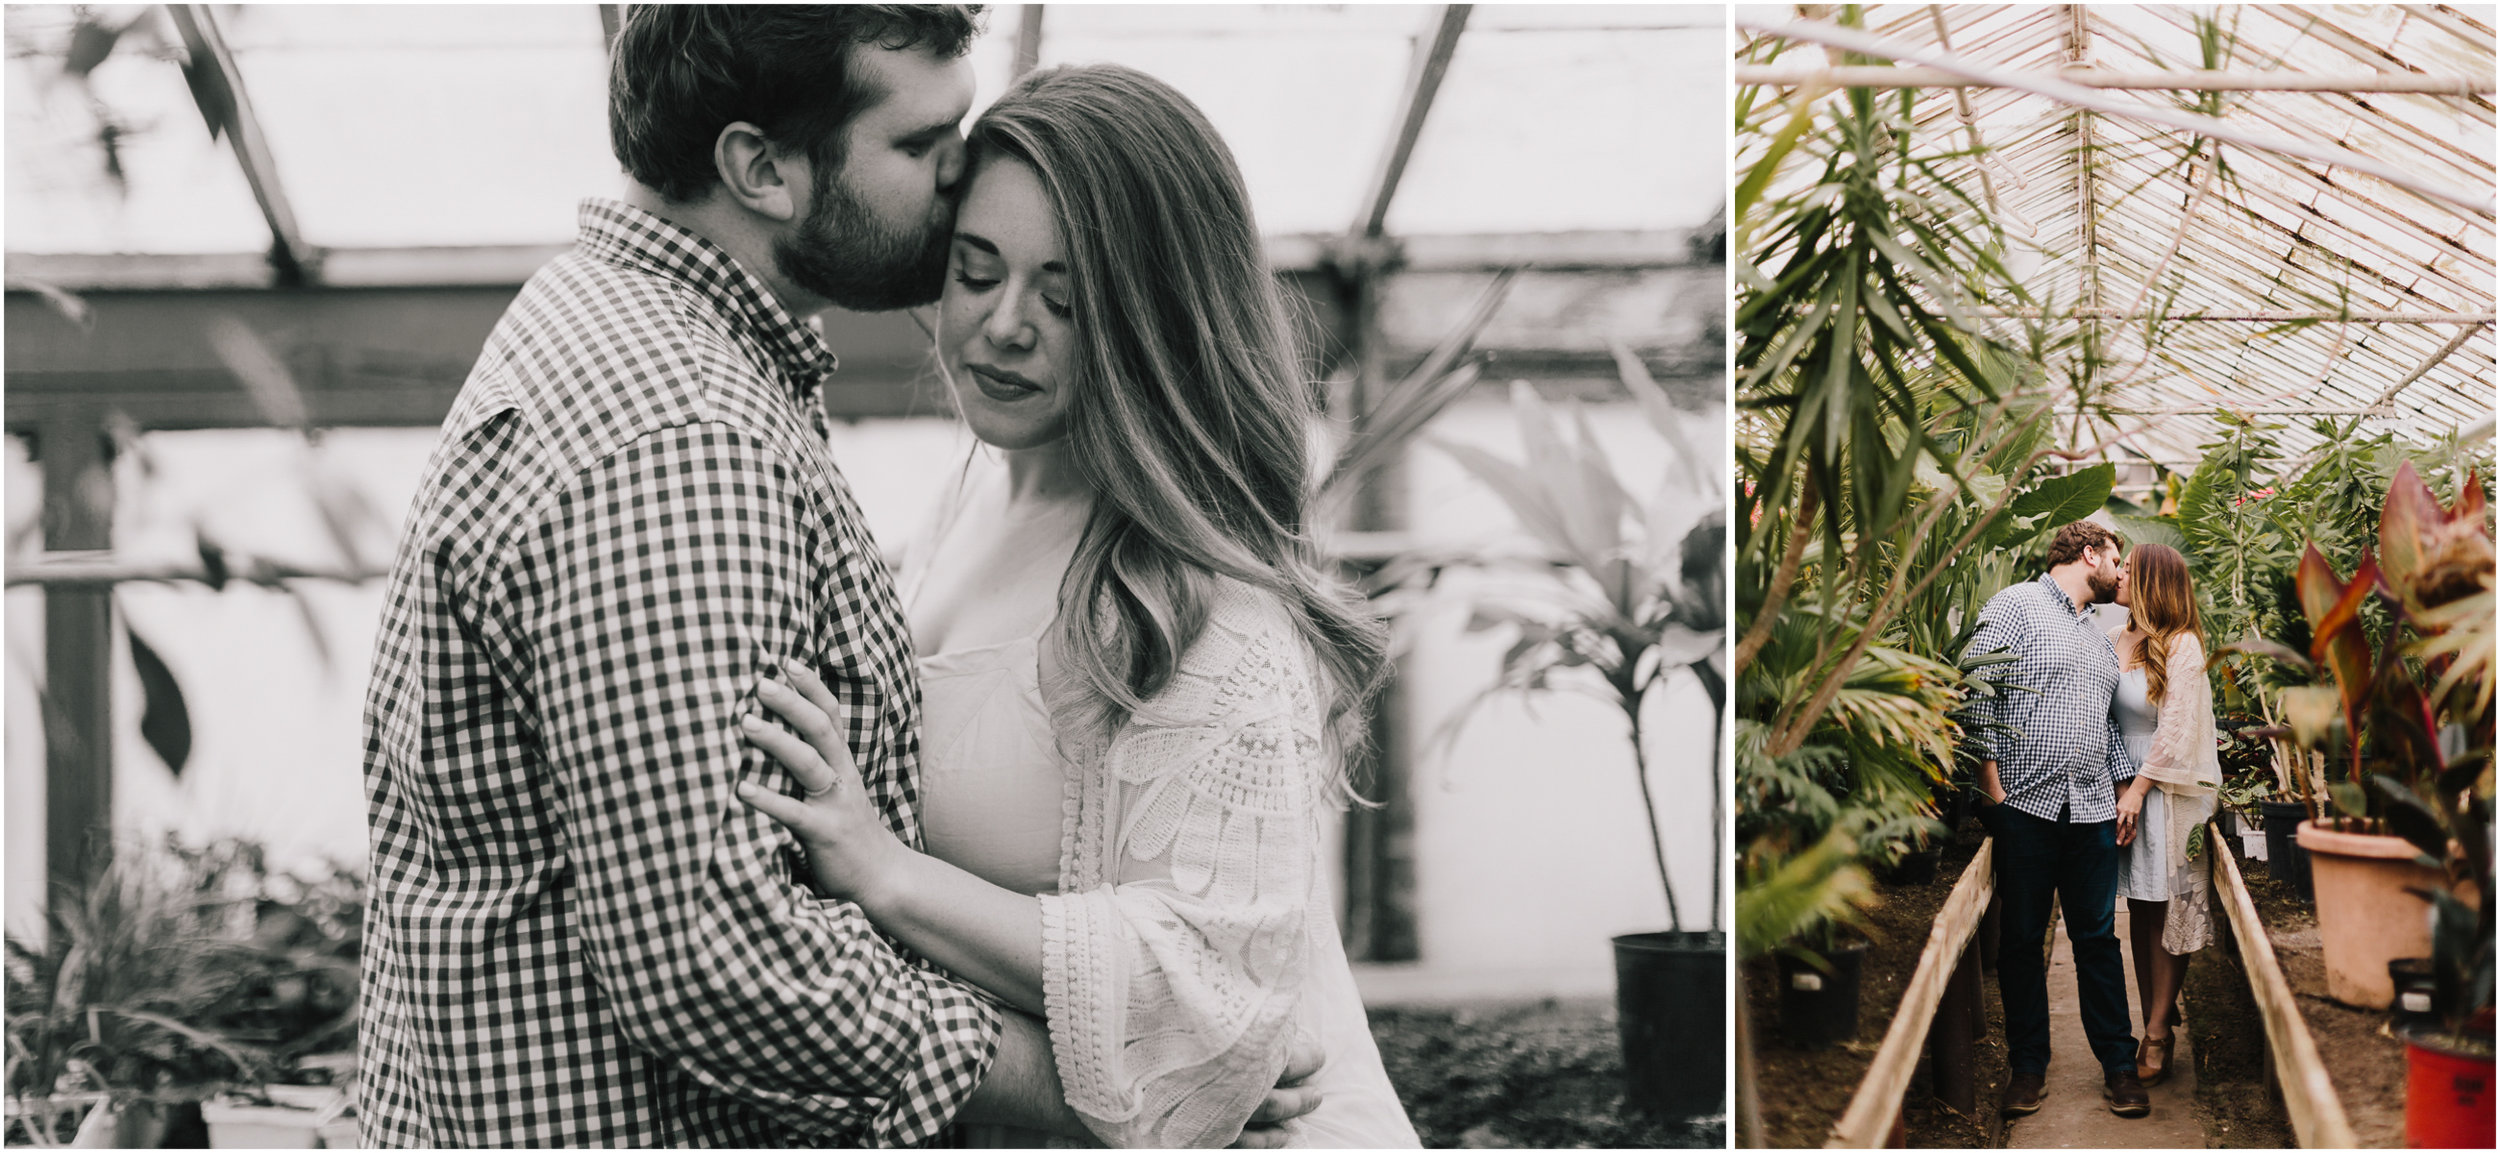 alyssa barletter photography greenhouse engagement photographer kansas city spring wedding-8.jpg